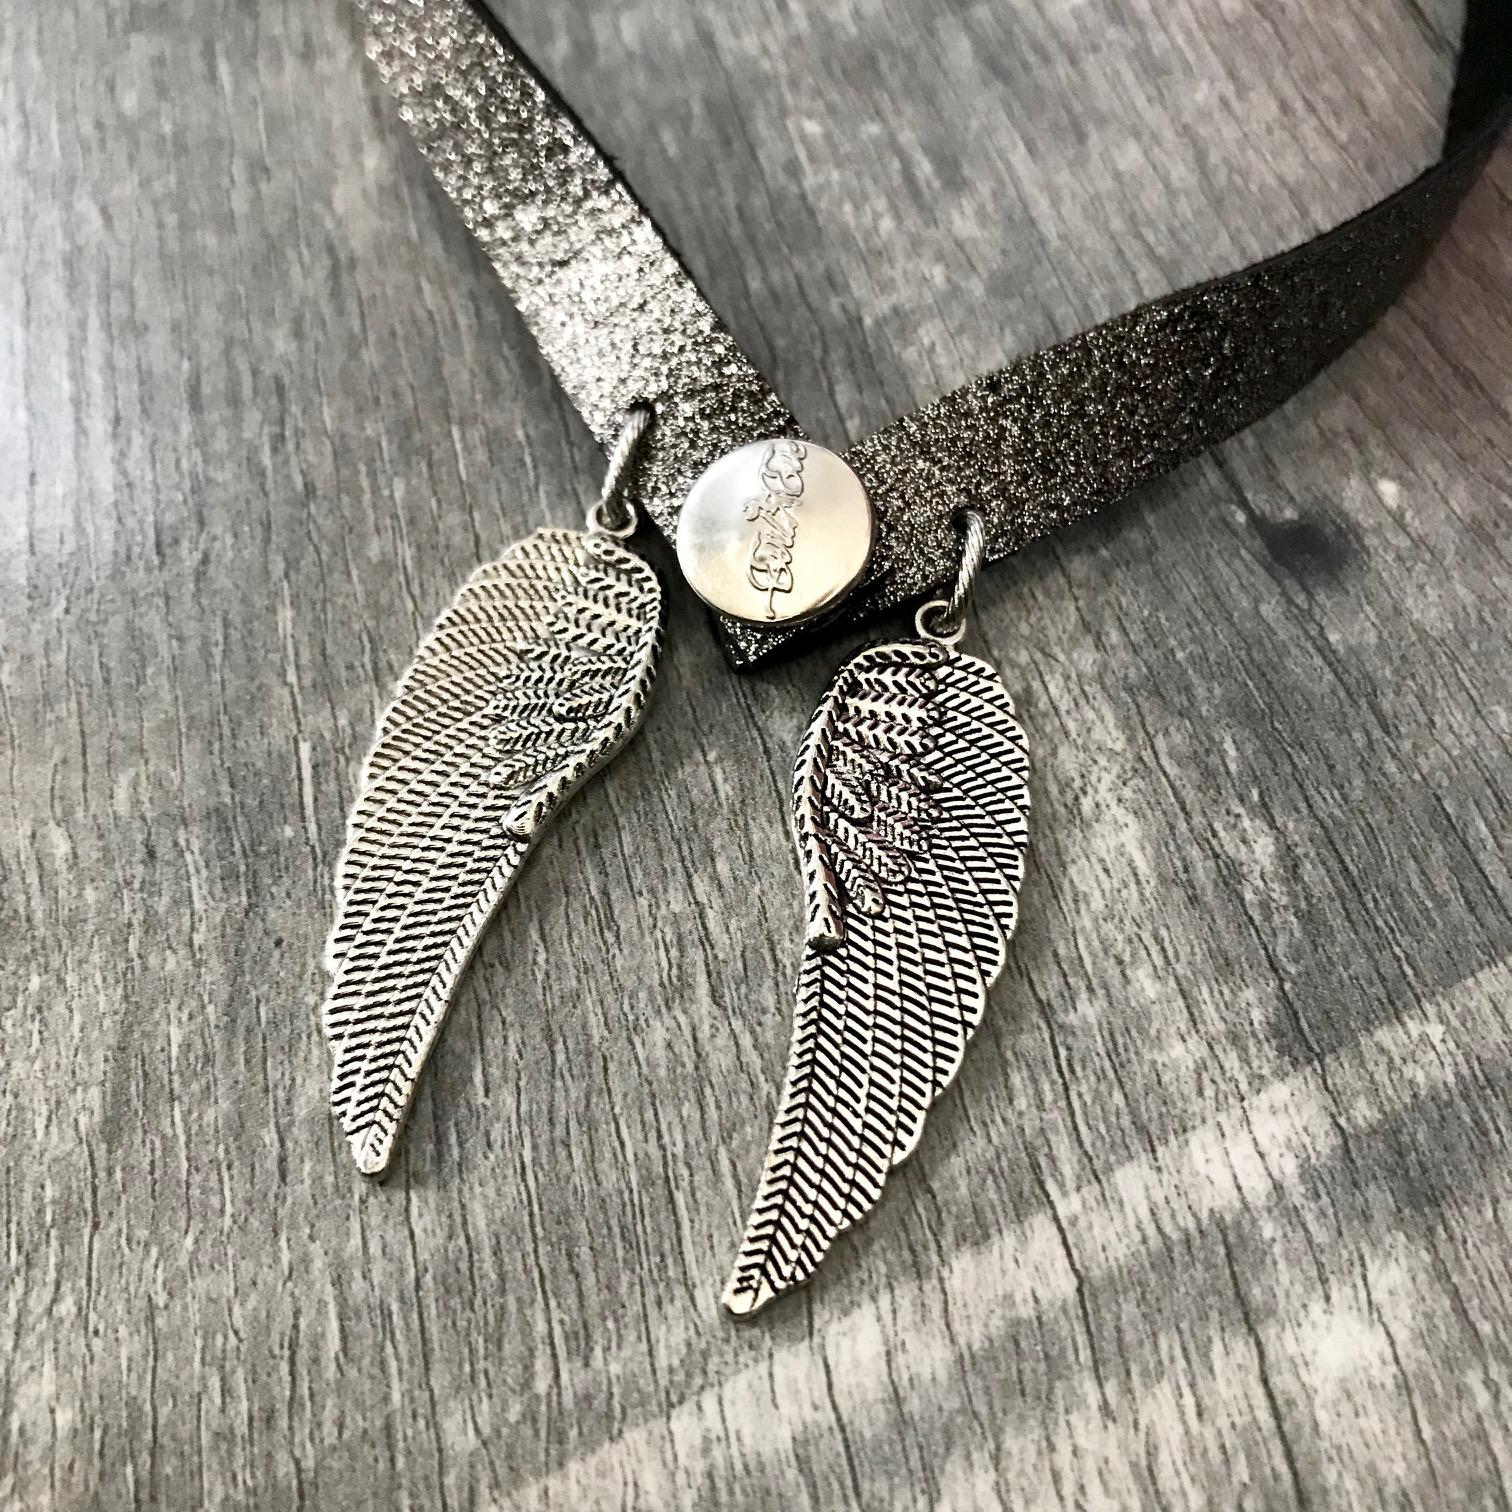 angelwings glitter silver black 4 v 1 evileve necklace bracelet